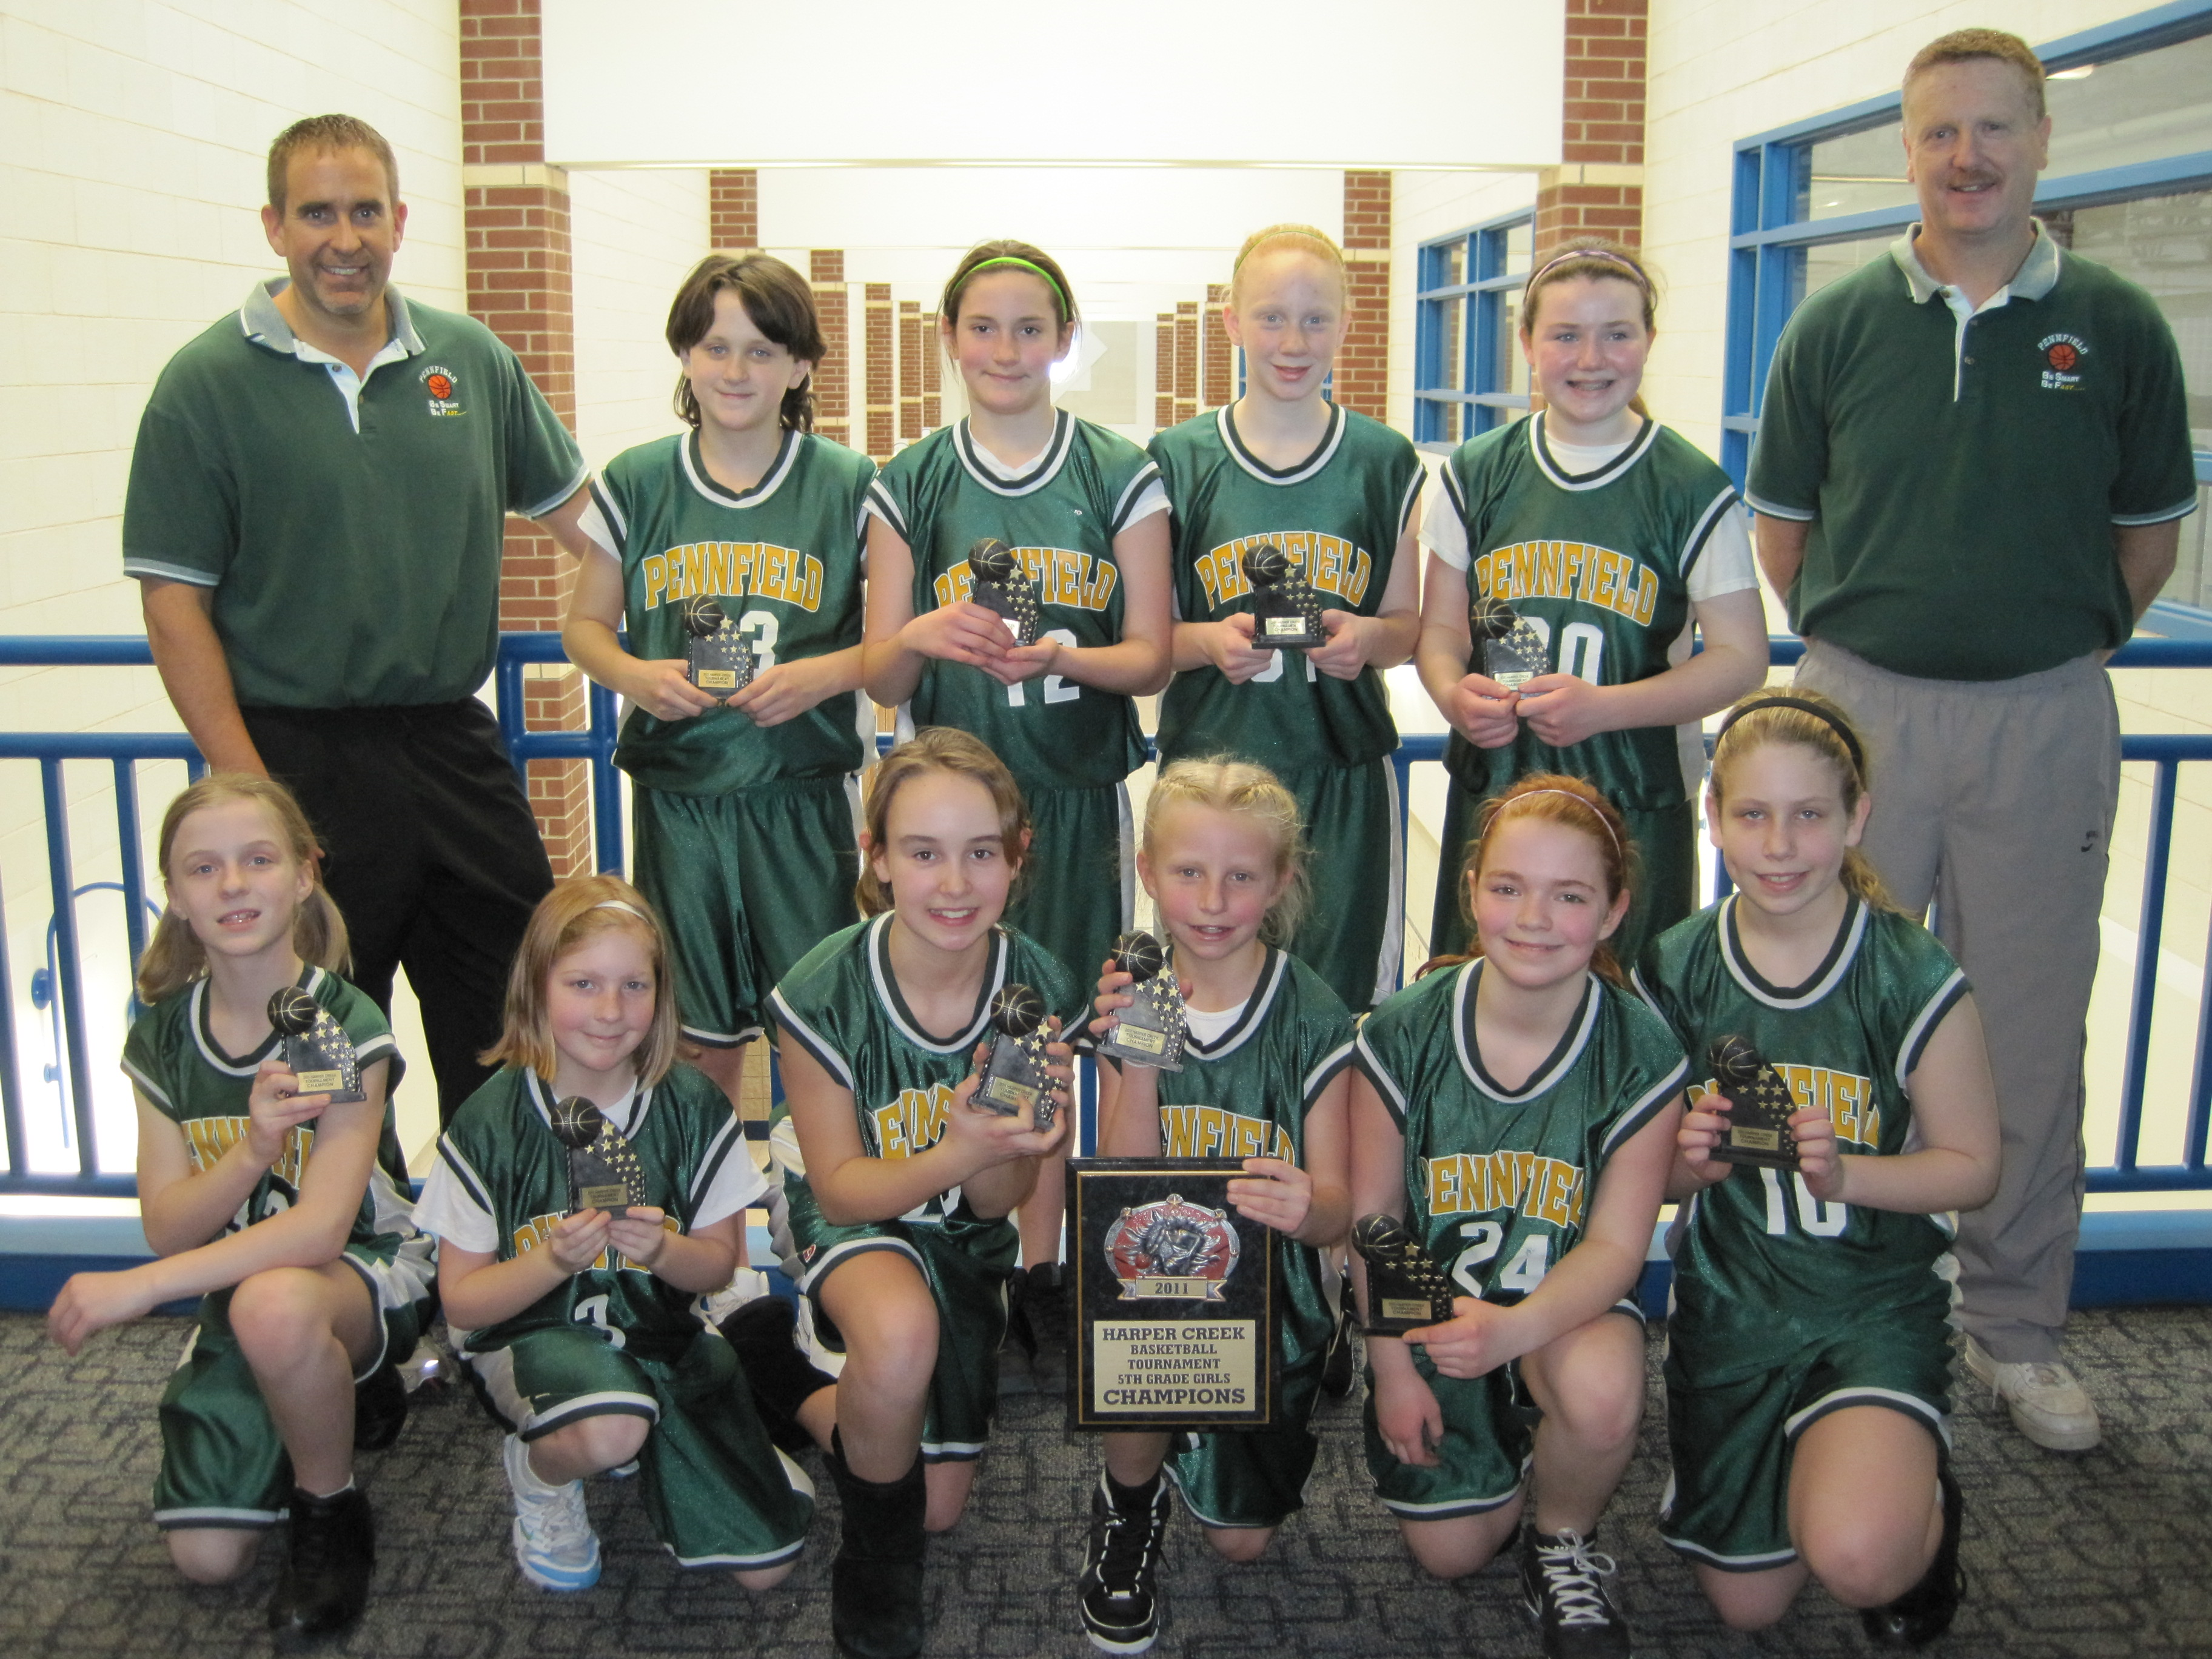 Harper creek 8th grade boys champions